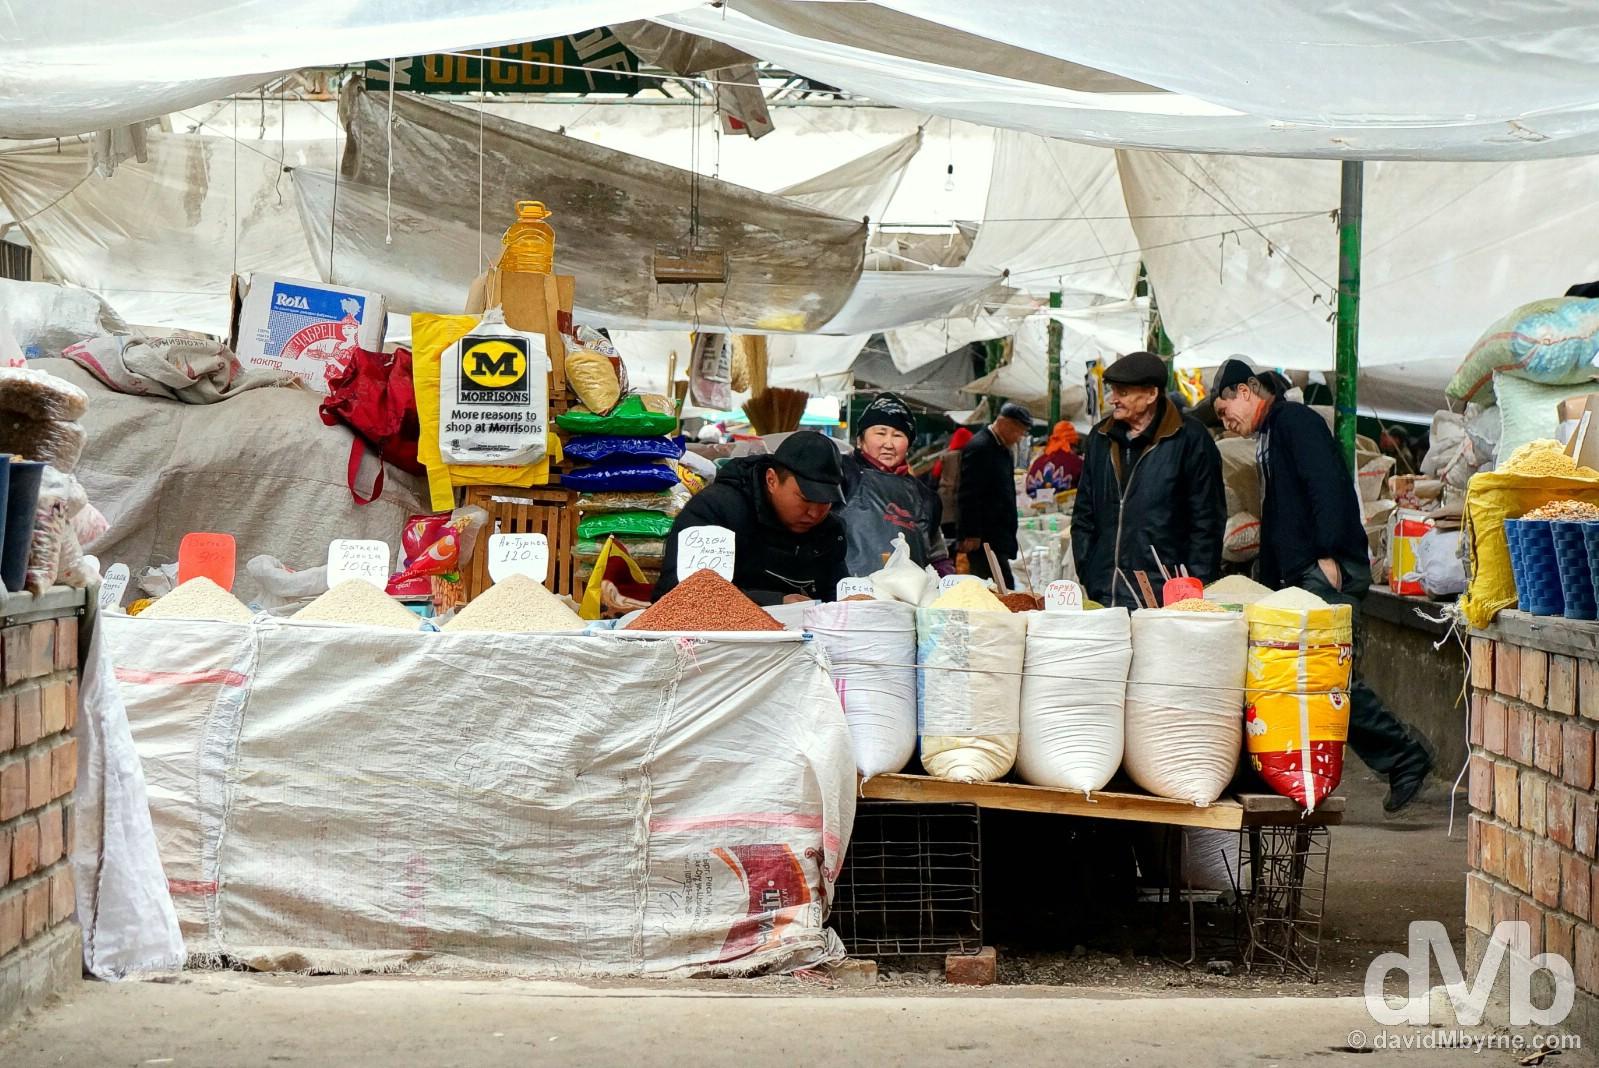 Osh Bazaar, Bishkek, Kyrgyzstan. February 25, 2015.